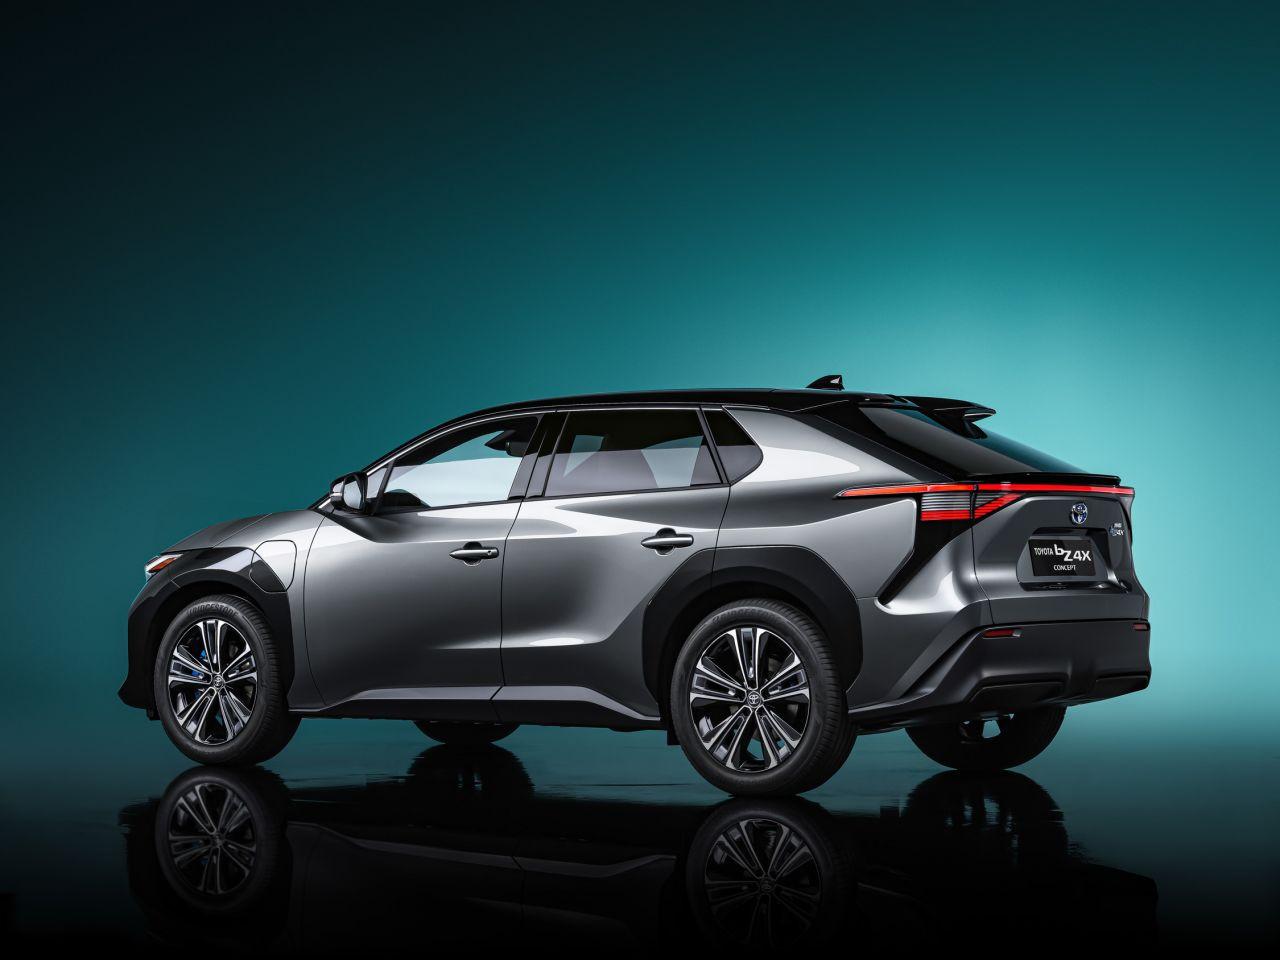 Toyota bZ4X ile yüzde 100 elektrikli otomobil pazarına giriyor - Page 4